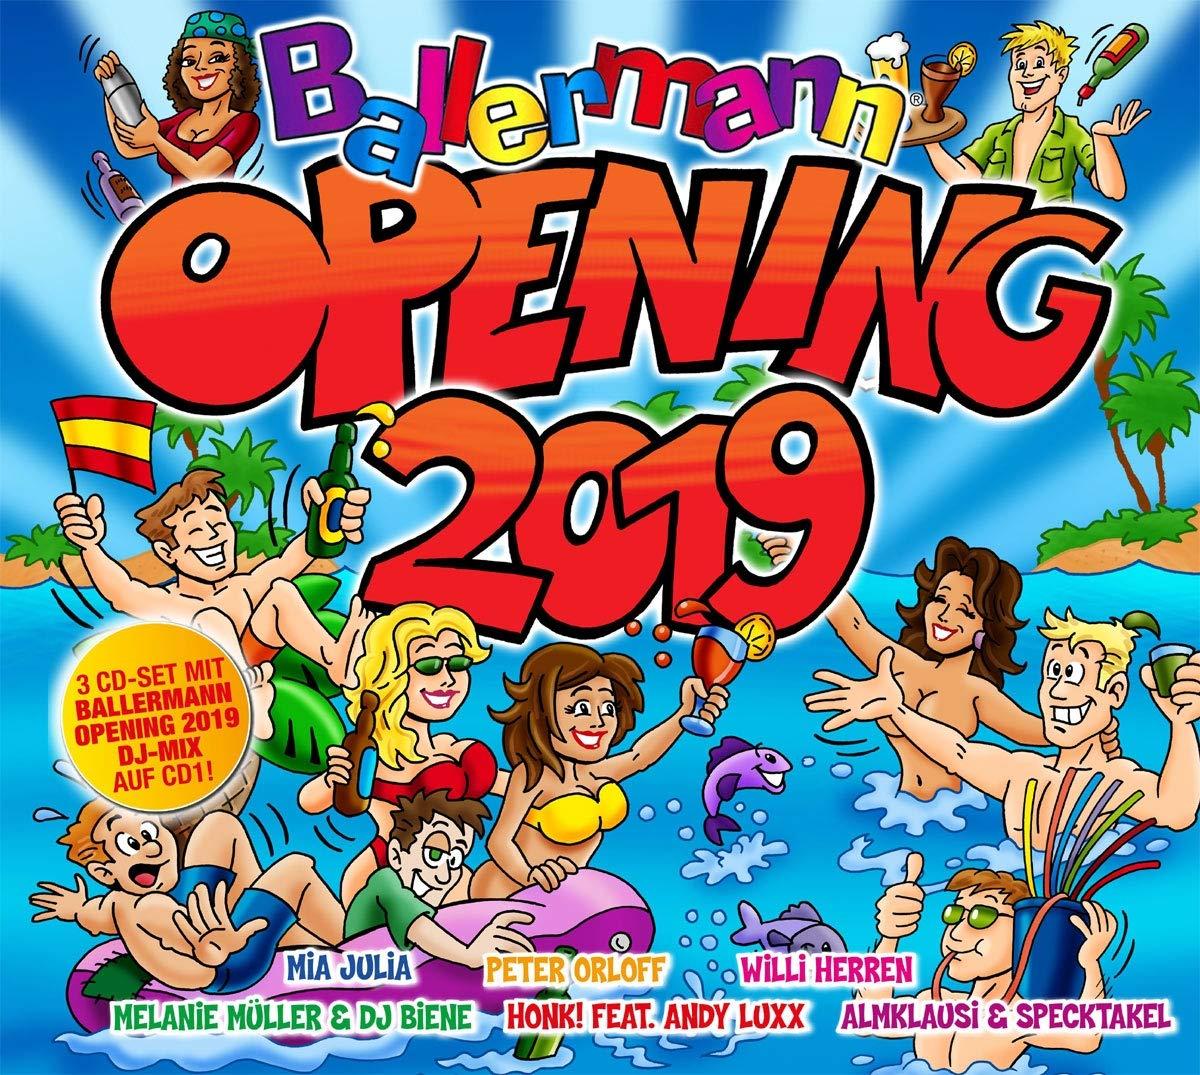 BALLERMANN OPENING 2019